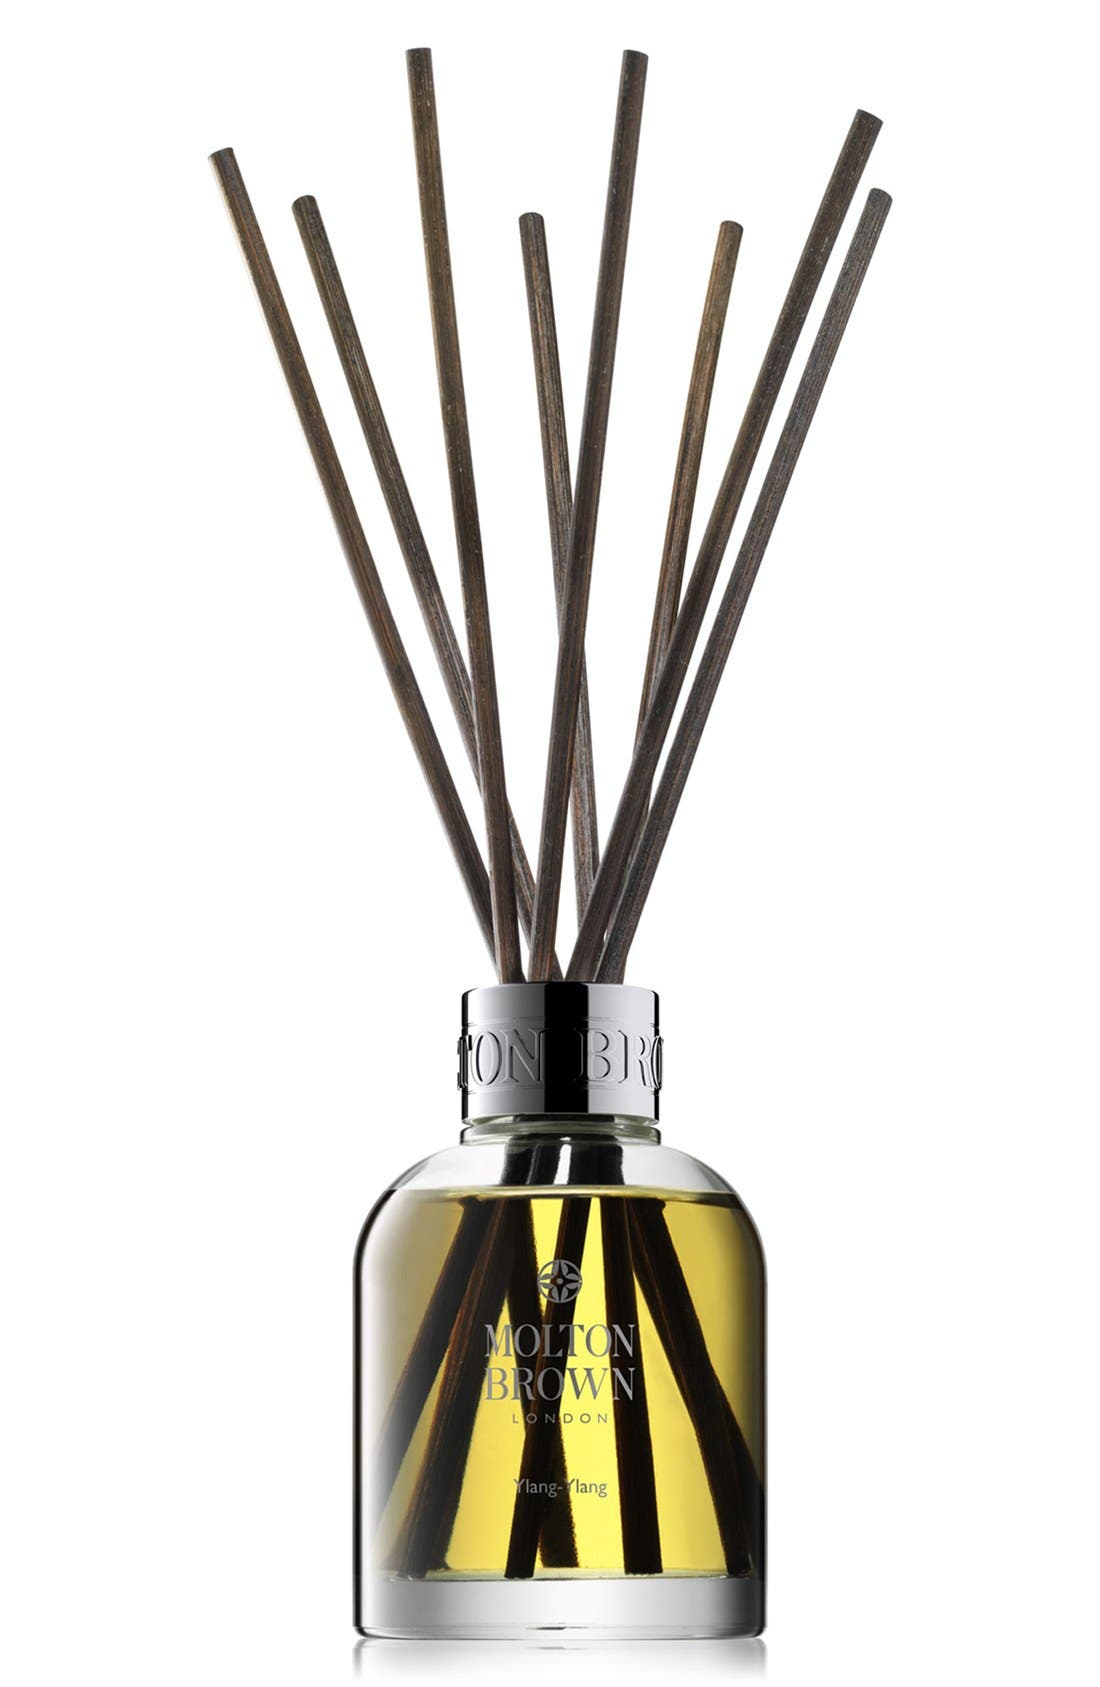 MOLTON BROWN London 'Ylang-Ylang' Aroma Reeds